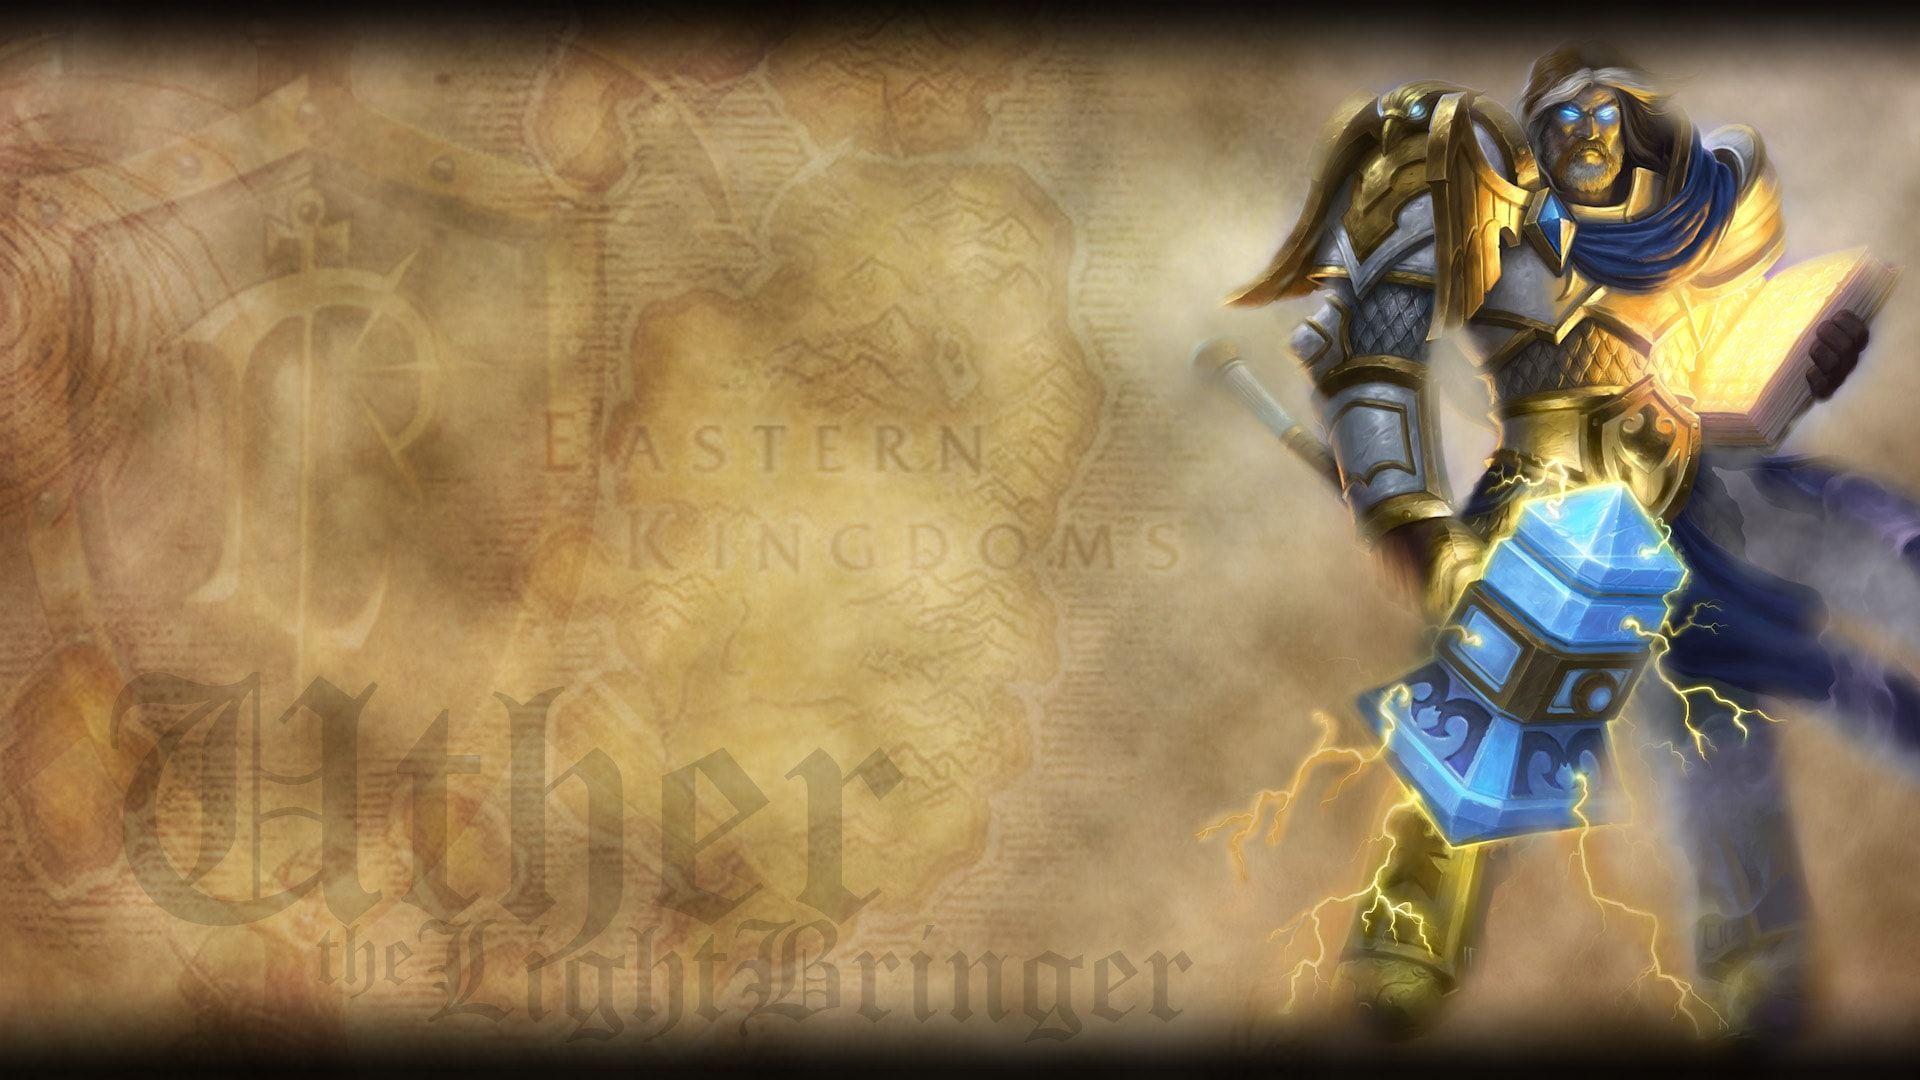 Full Hd P Paladin Wallpapers Hd Desktop Backgrounds 1920 1080 Wow Paladin Wallpaper 44 Wallpapers Adorable Wallpapers Paladin Wallpaper World Of Warcraft